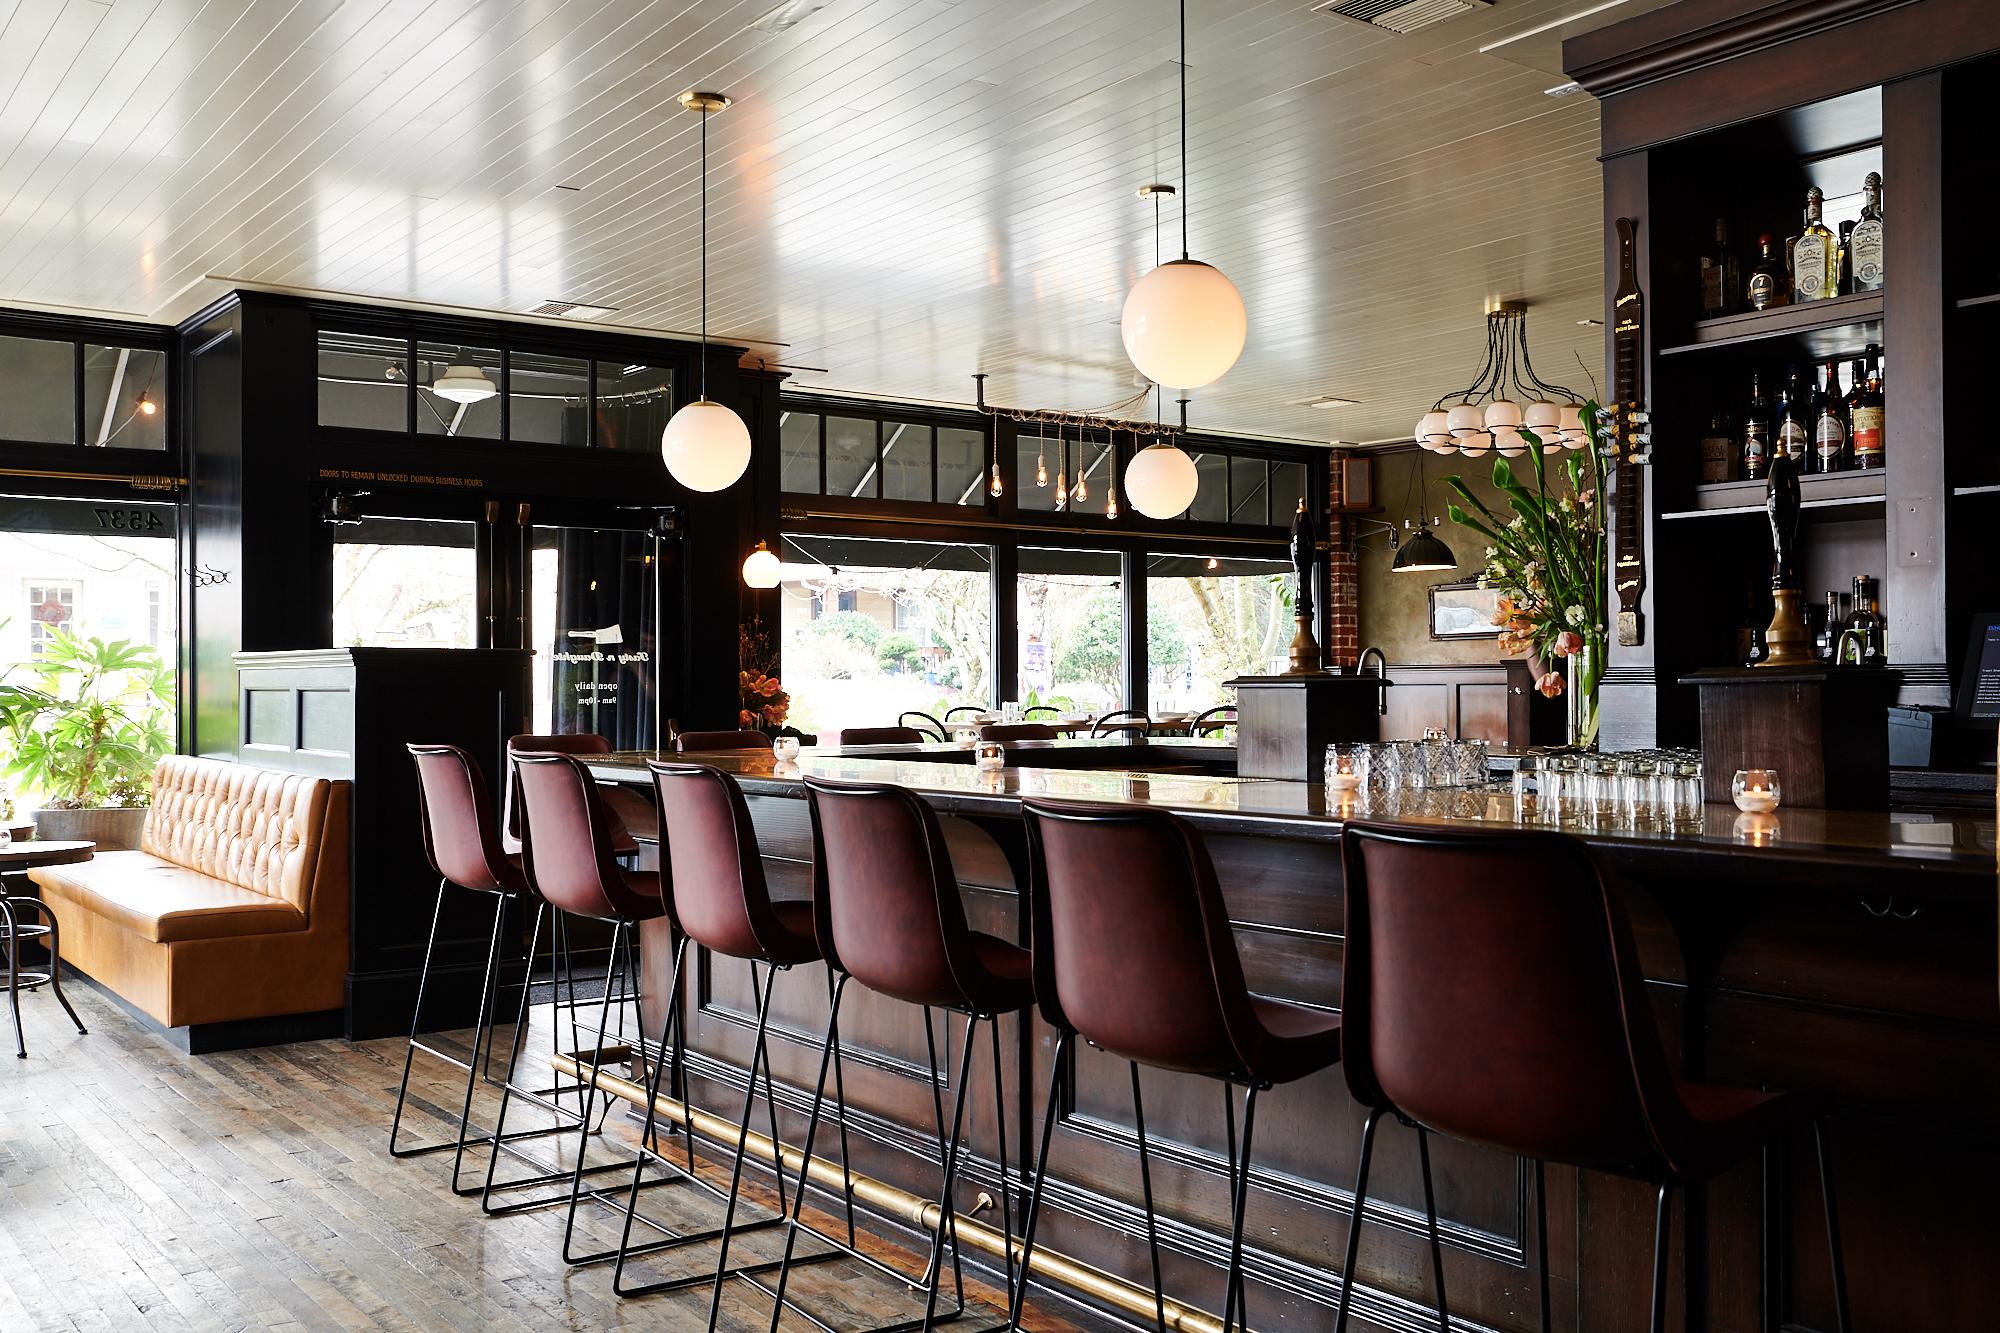 bbfca35d443 The Hottest Restaurants in Portland